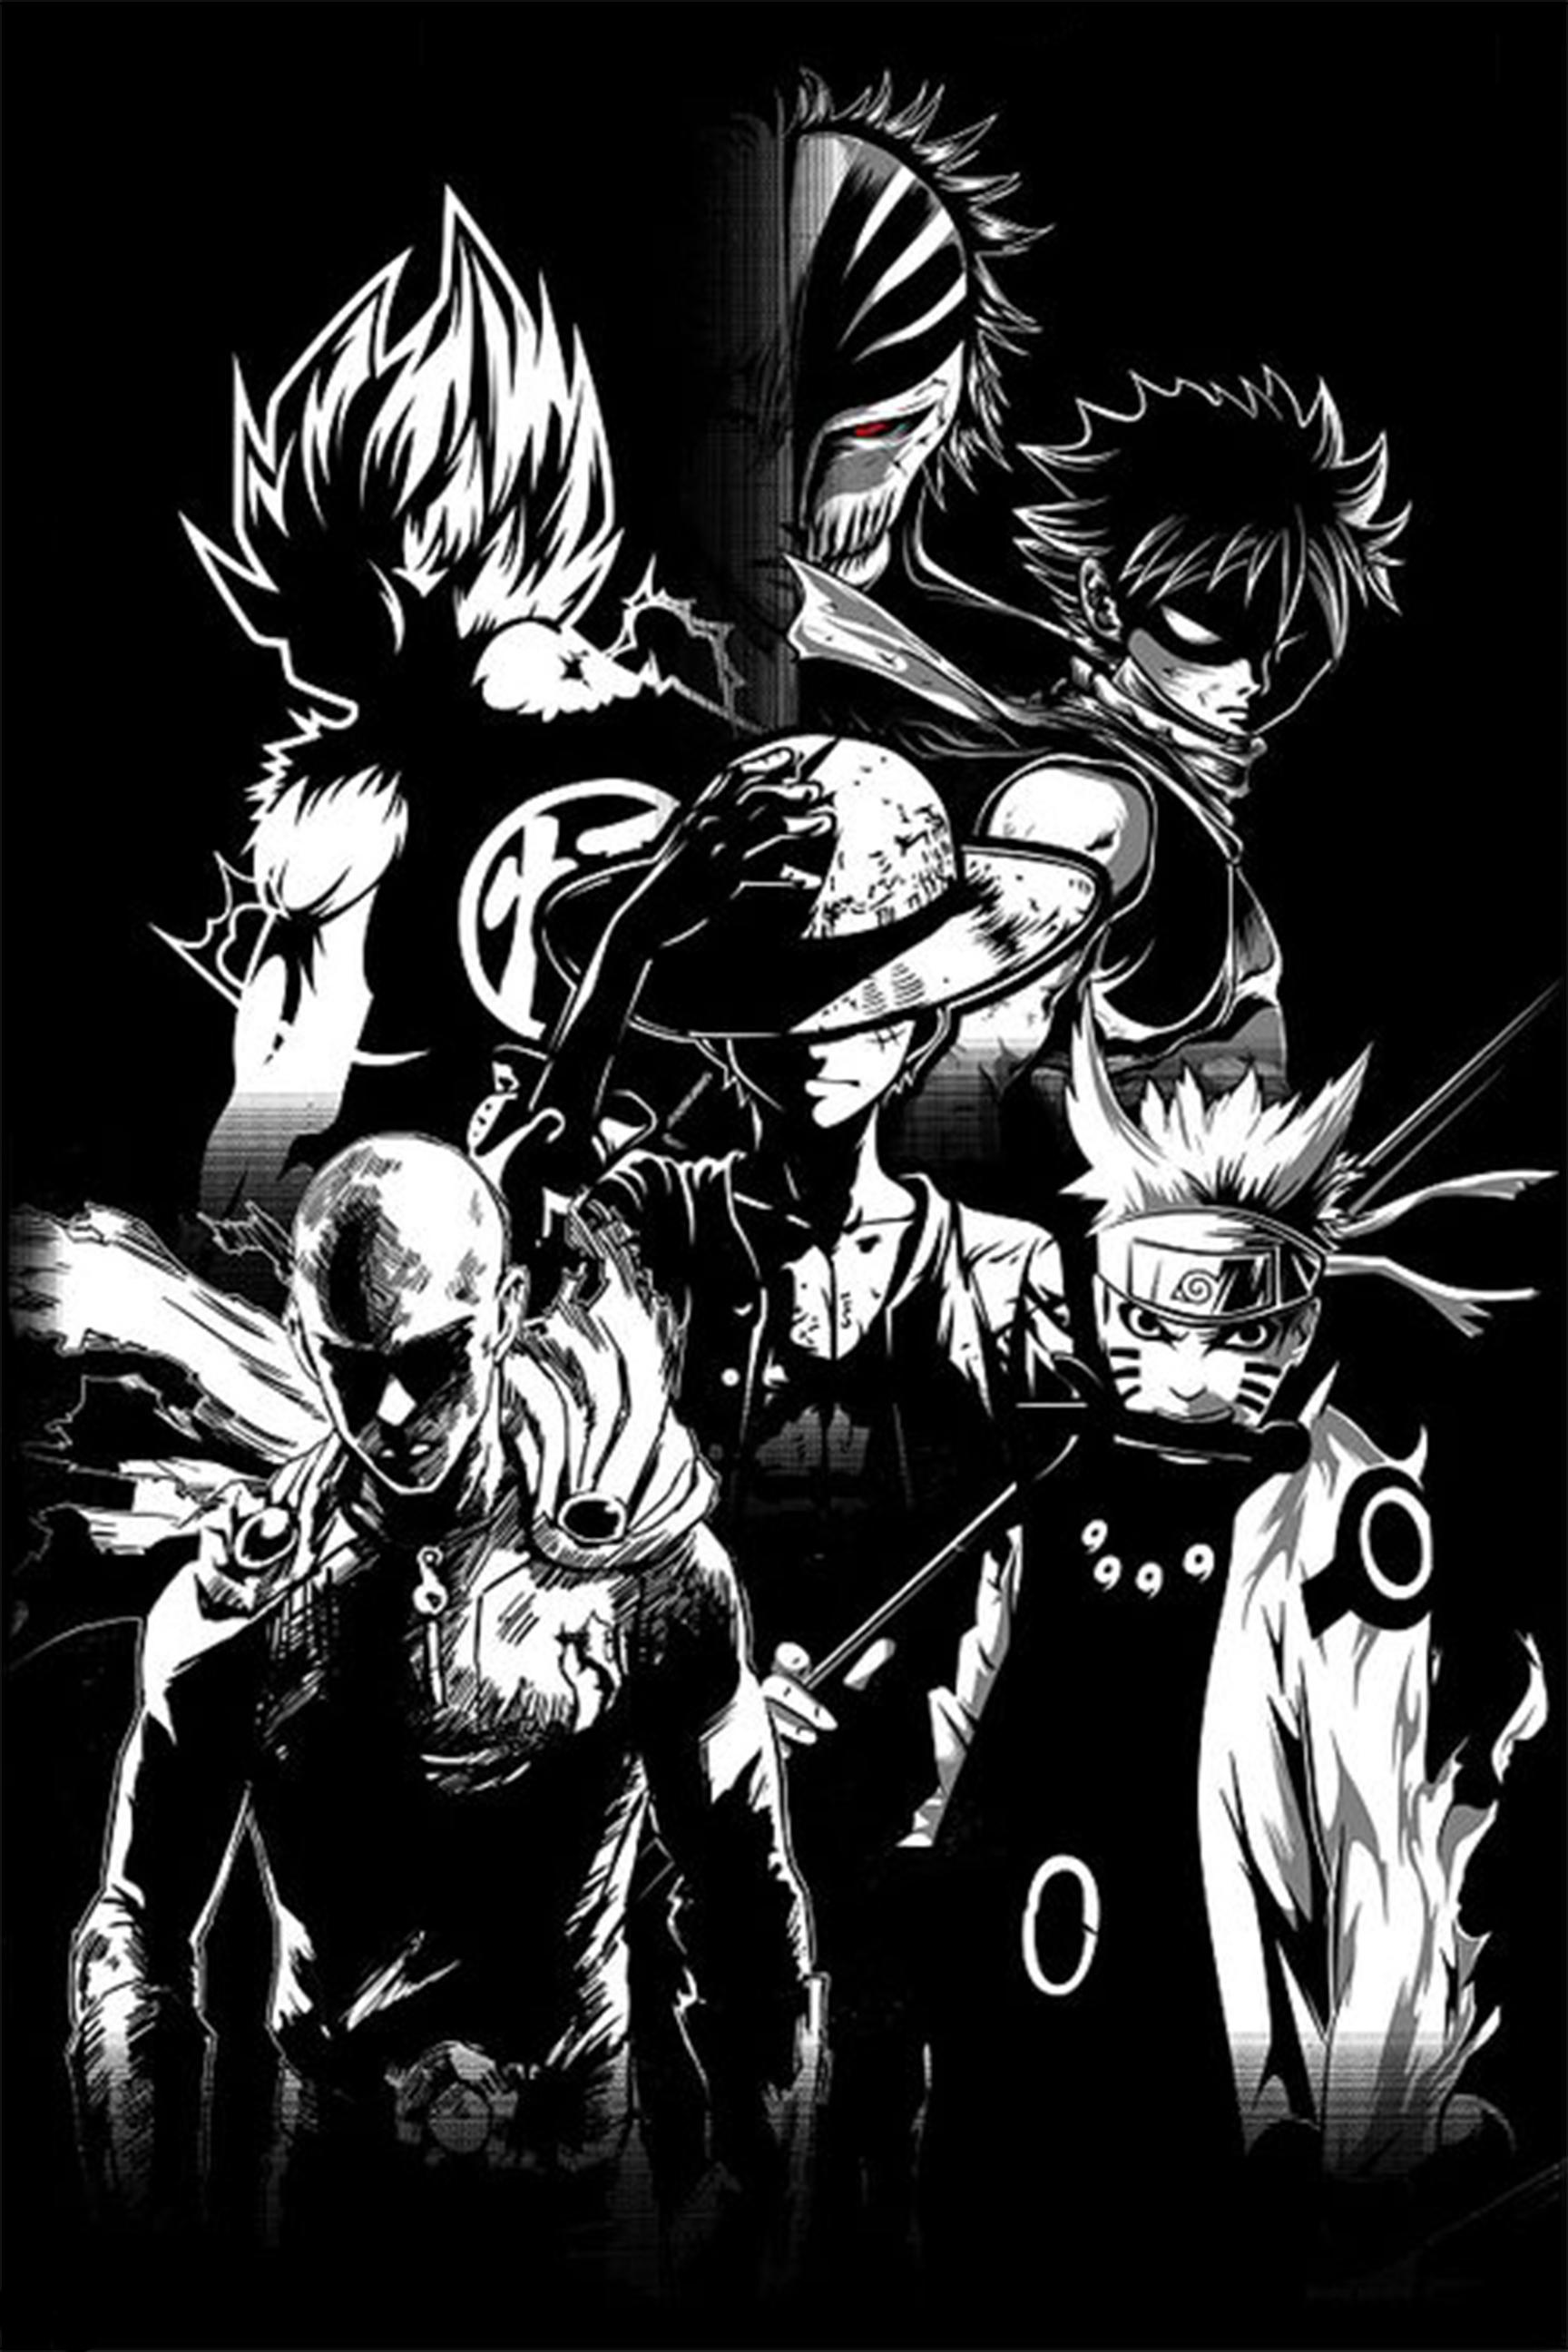 Unique Naruto One Piece Anime Anime Wallpaper